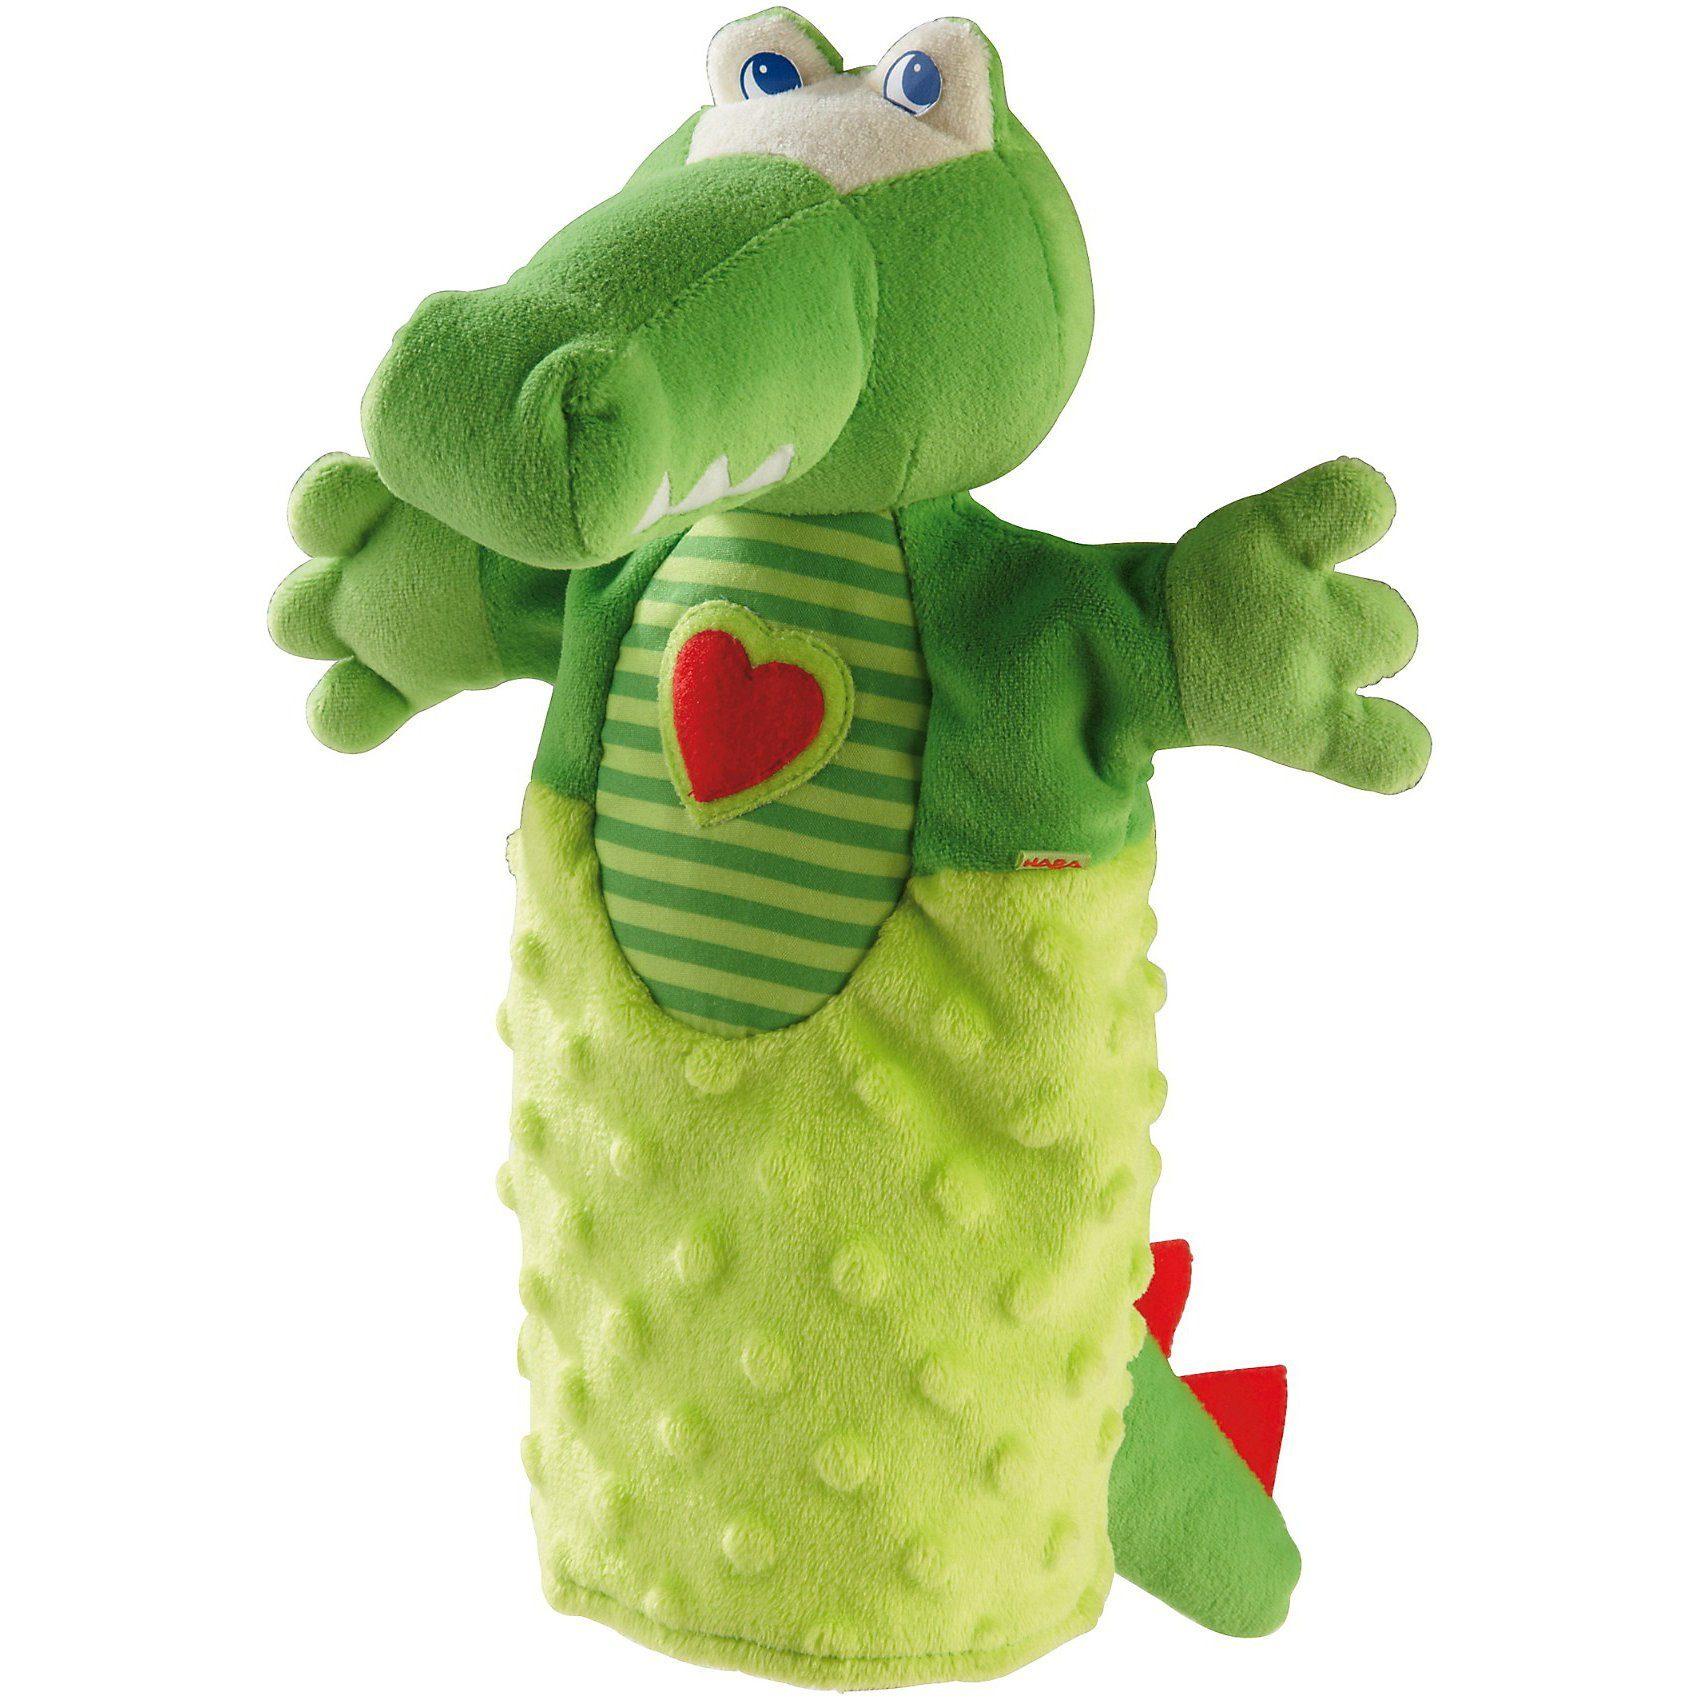 Haba 2178 Handpuppe Krokodil, 25 cm